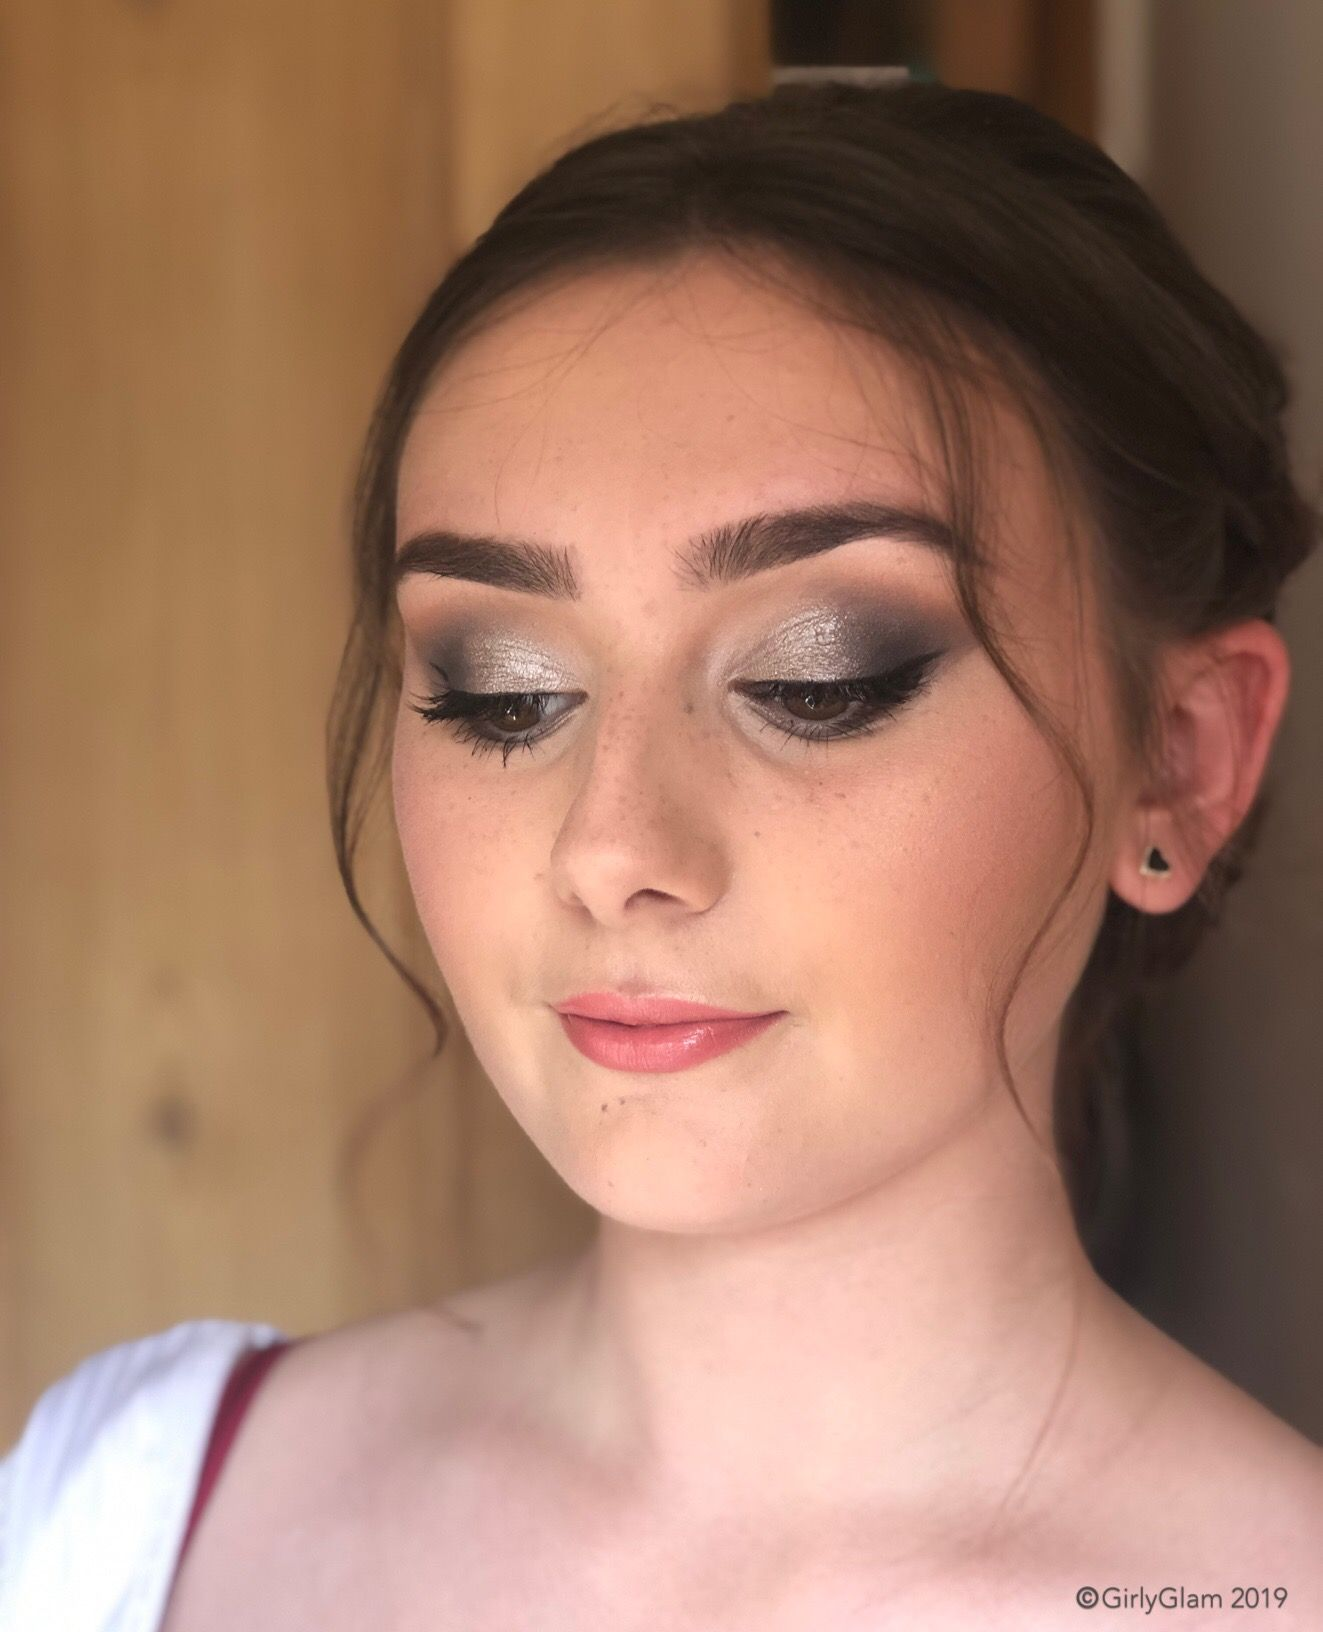 Pin on GirlyGlam MakeUp, Hair & Lash Extensions